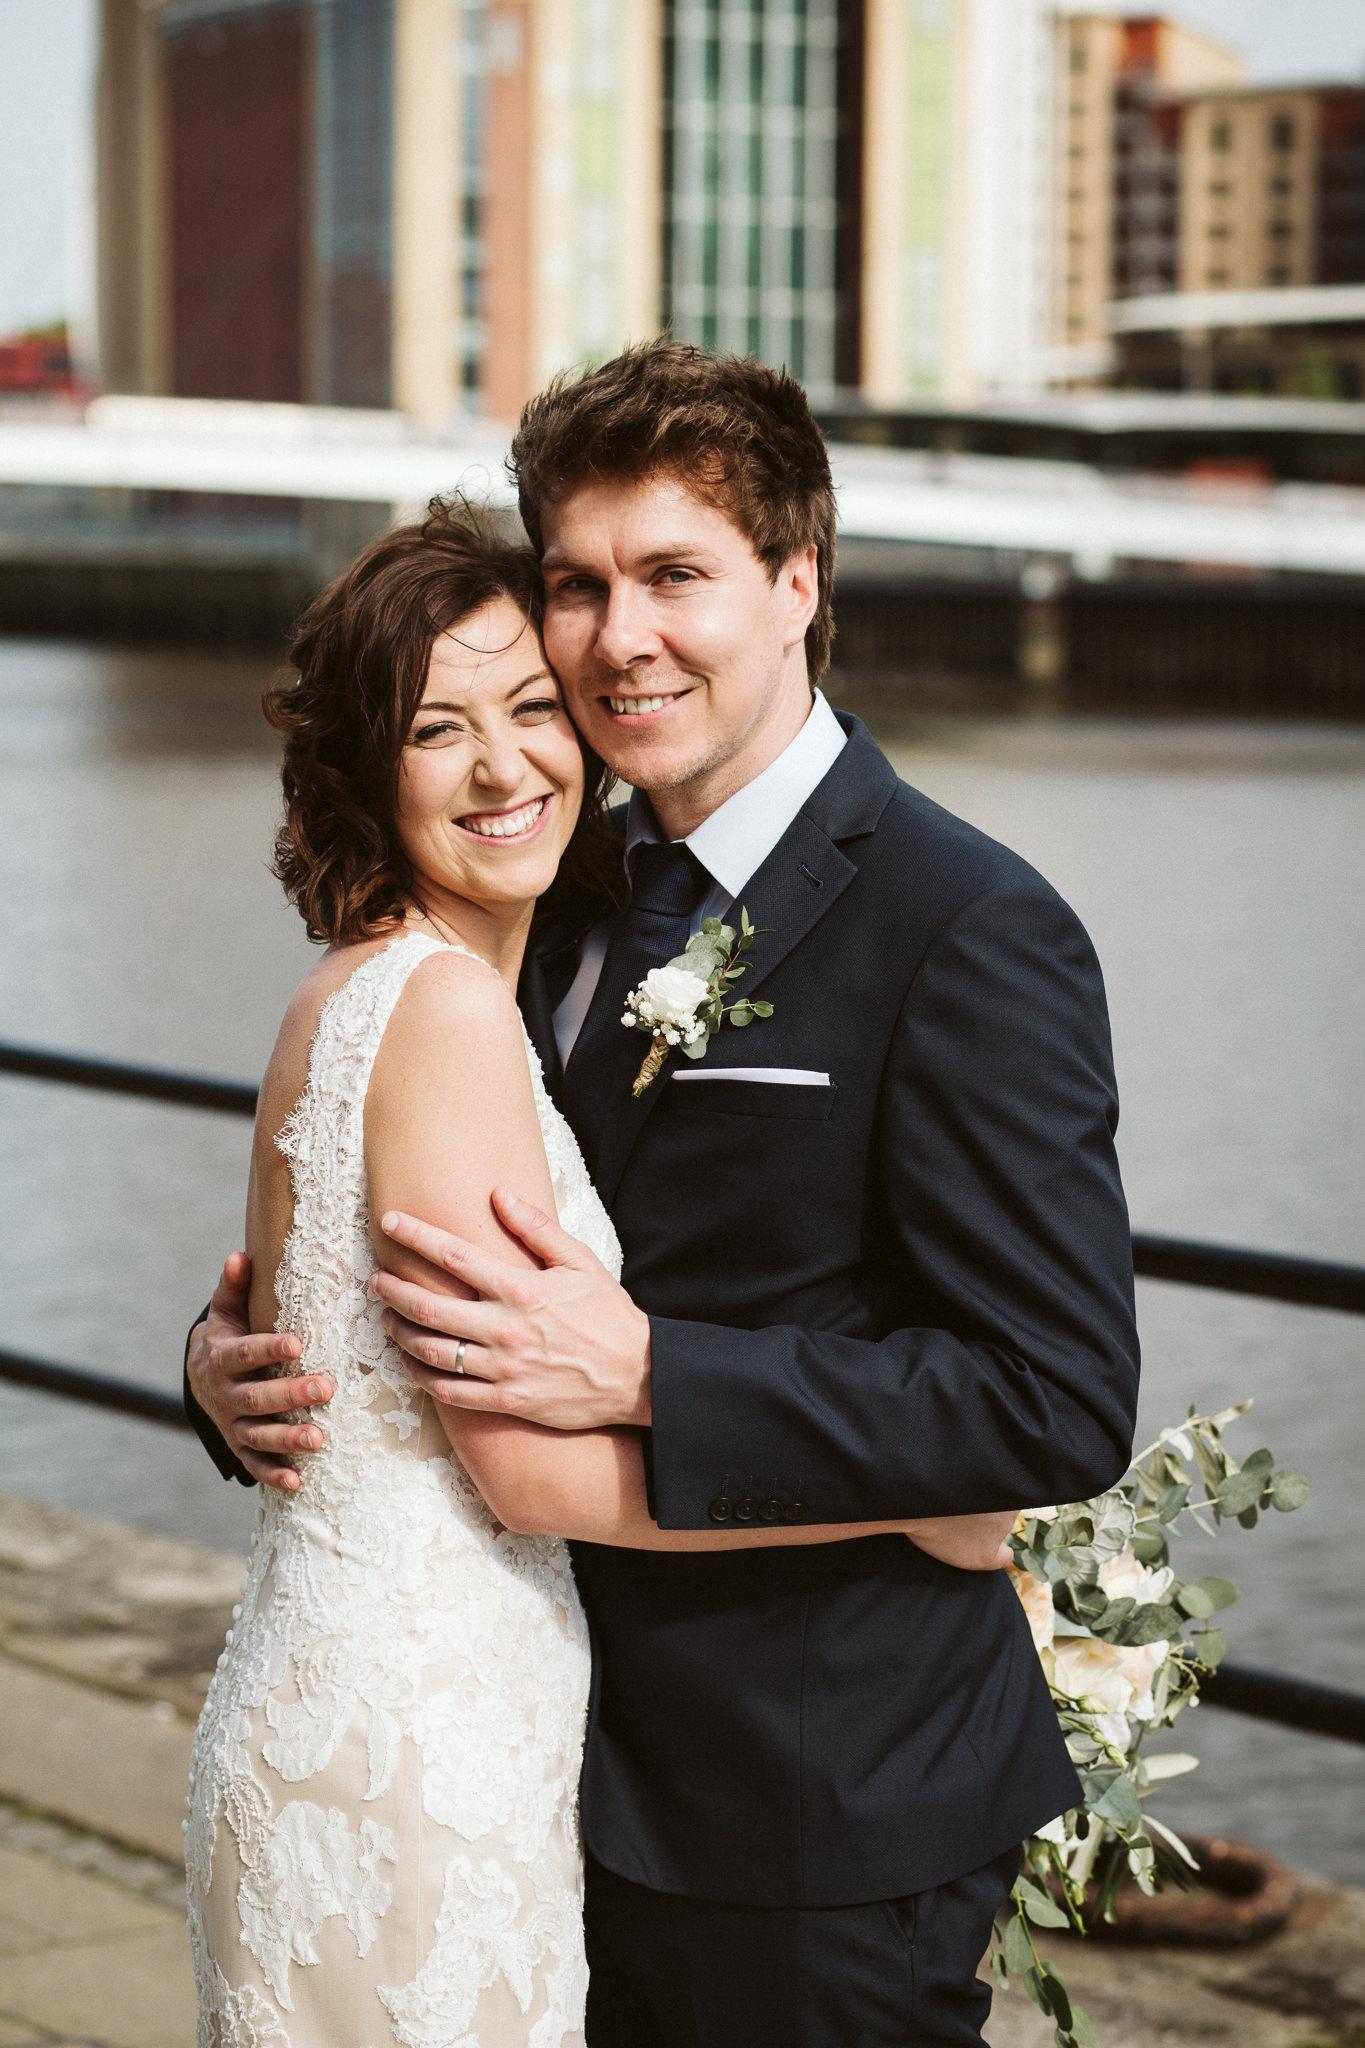 baltic-wedding-margarita-hope (55).jpg